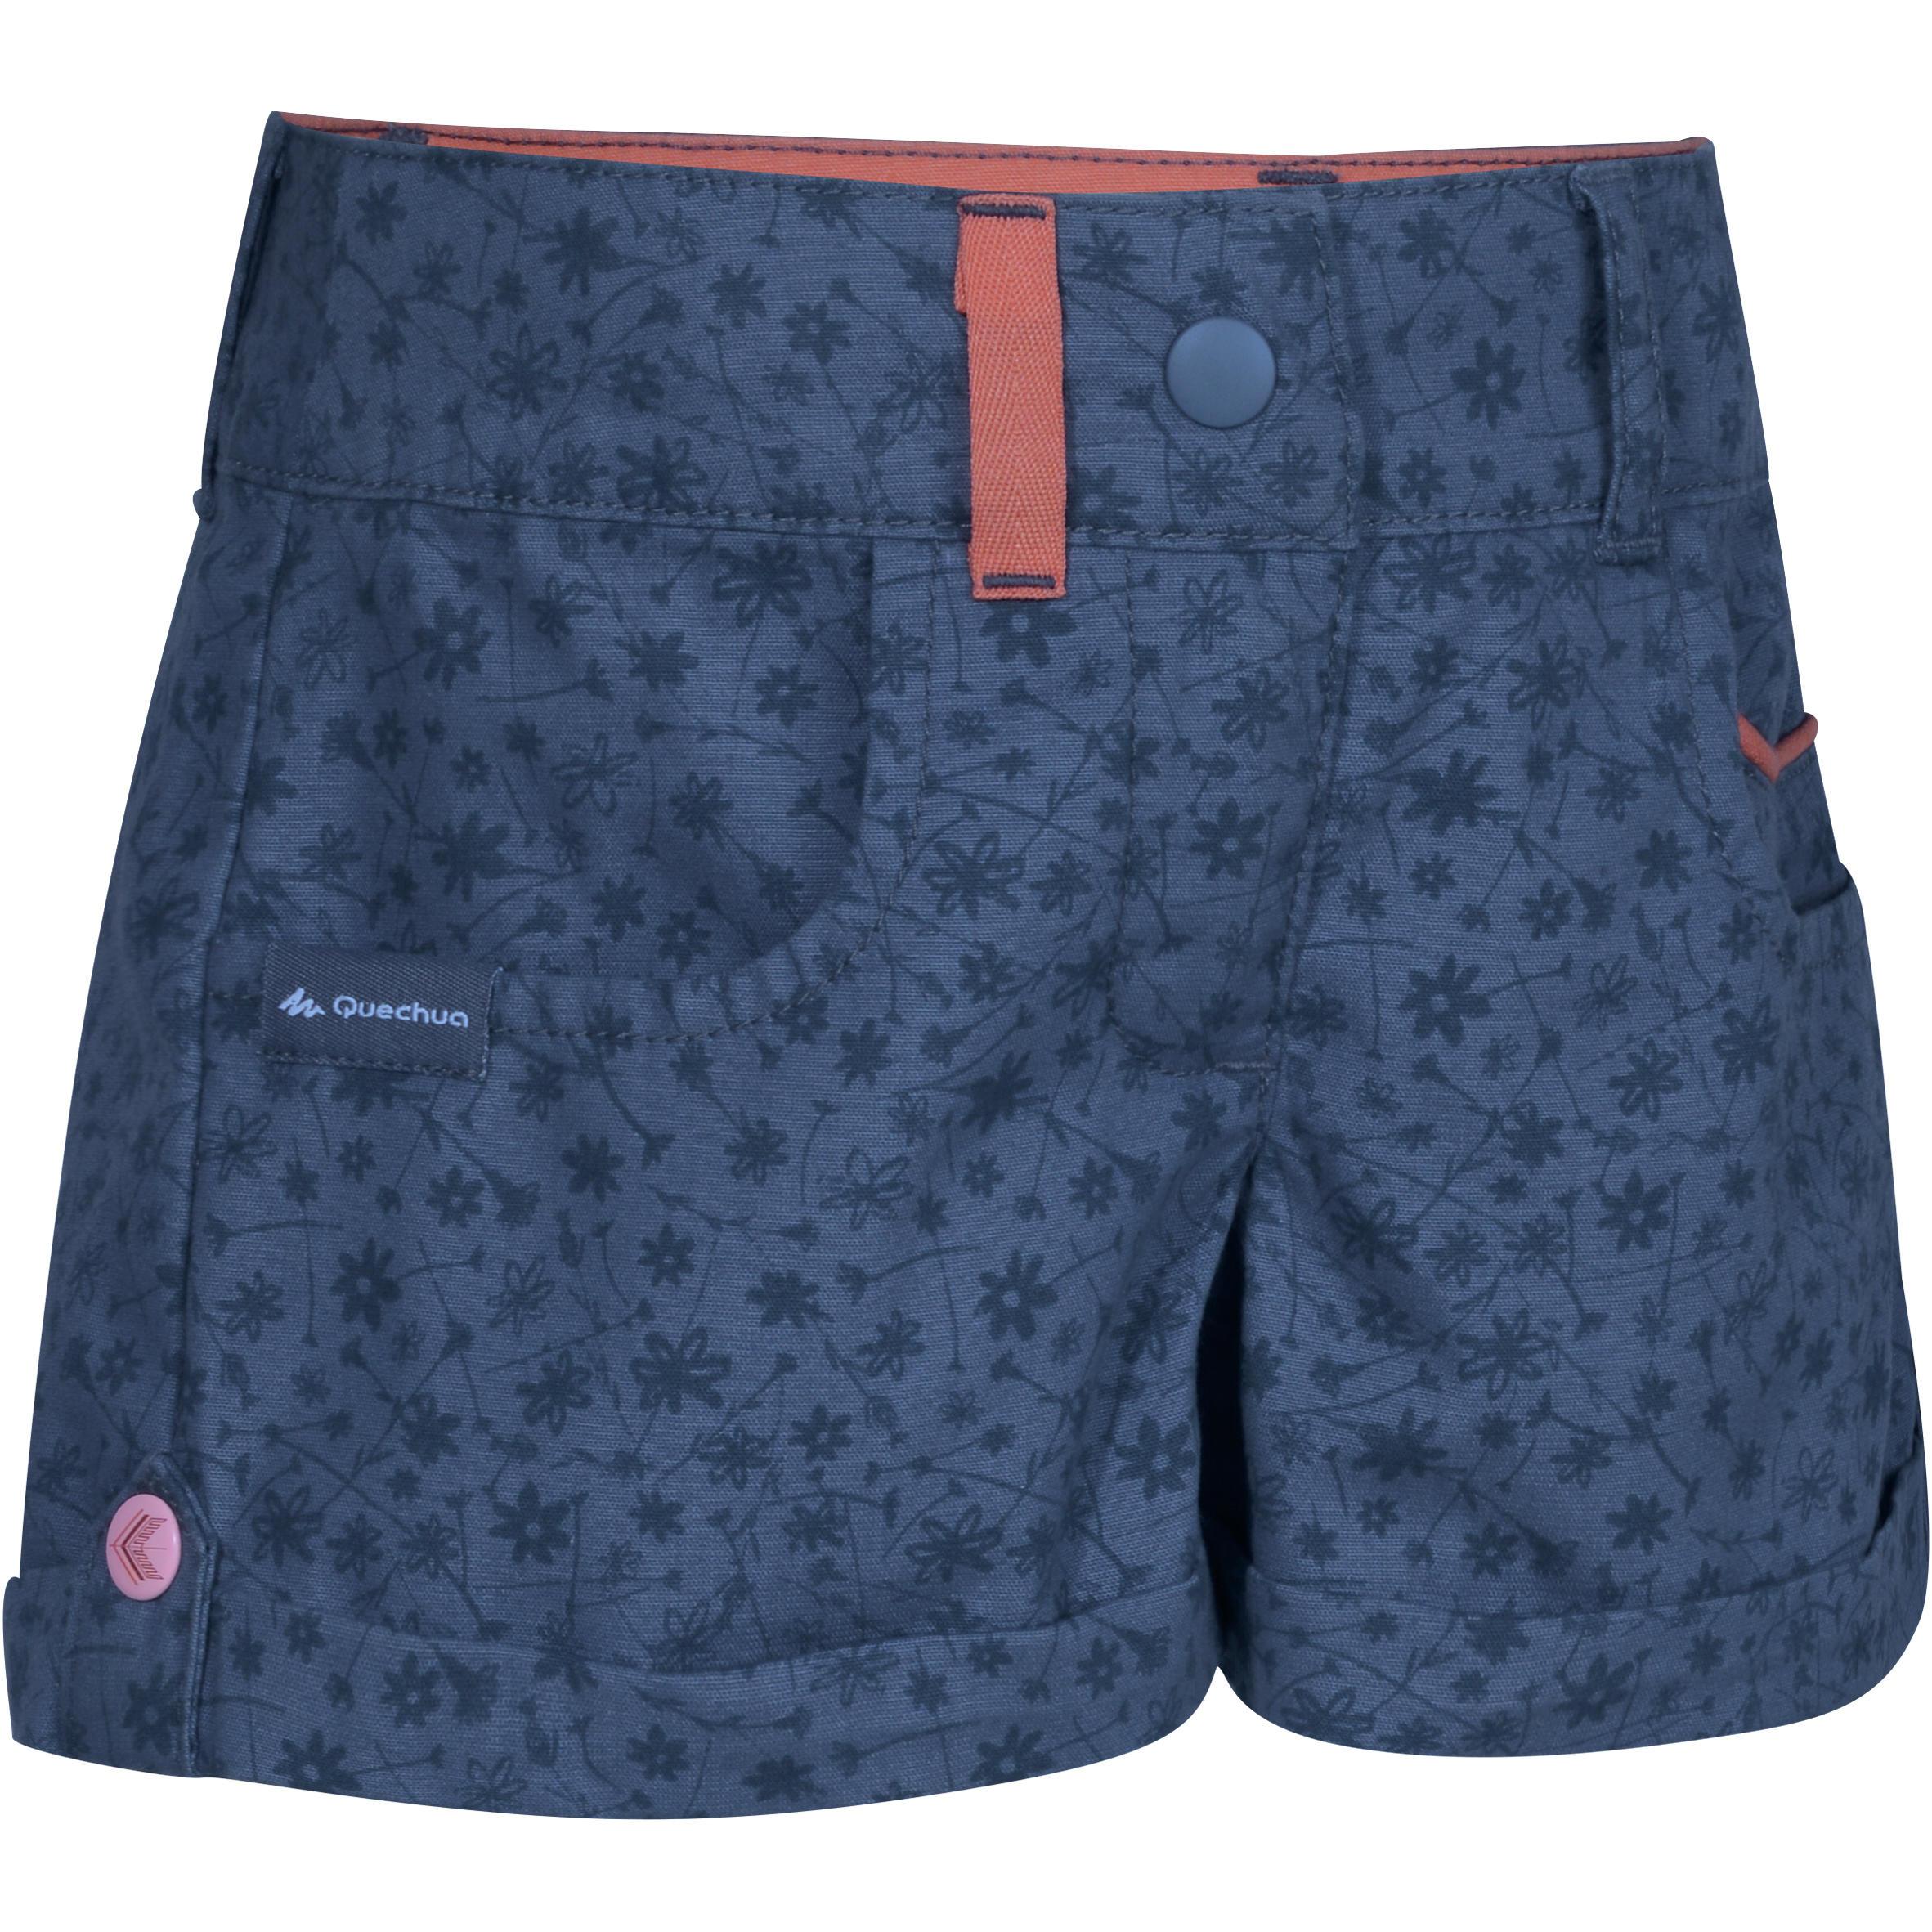 Hike 500 Children's Hiking Shorts - Blue